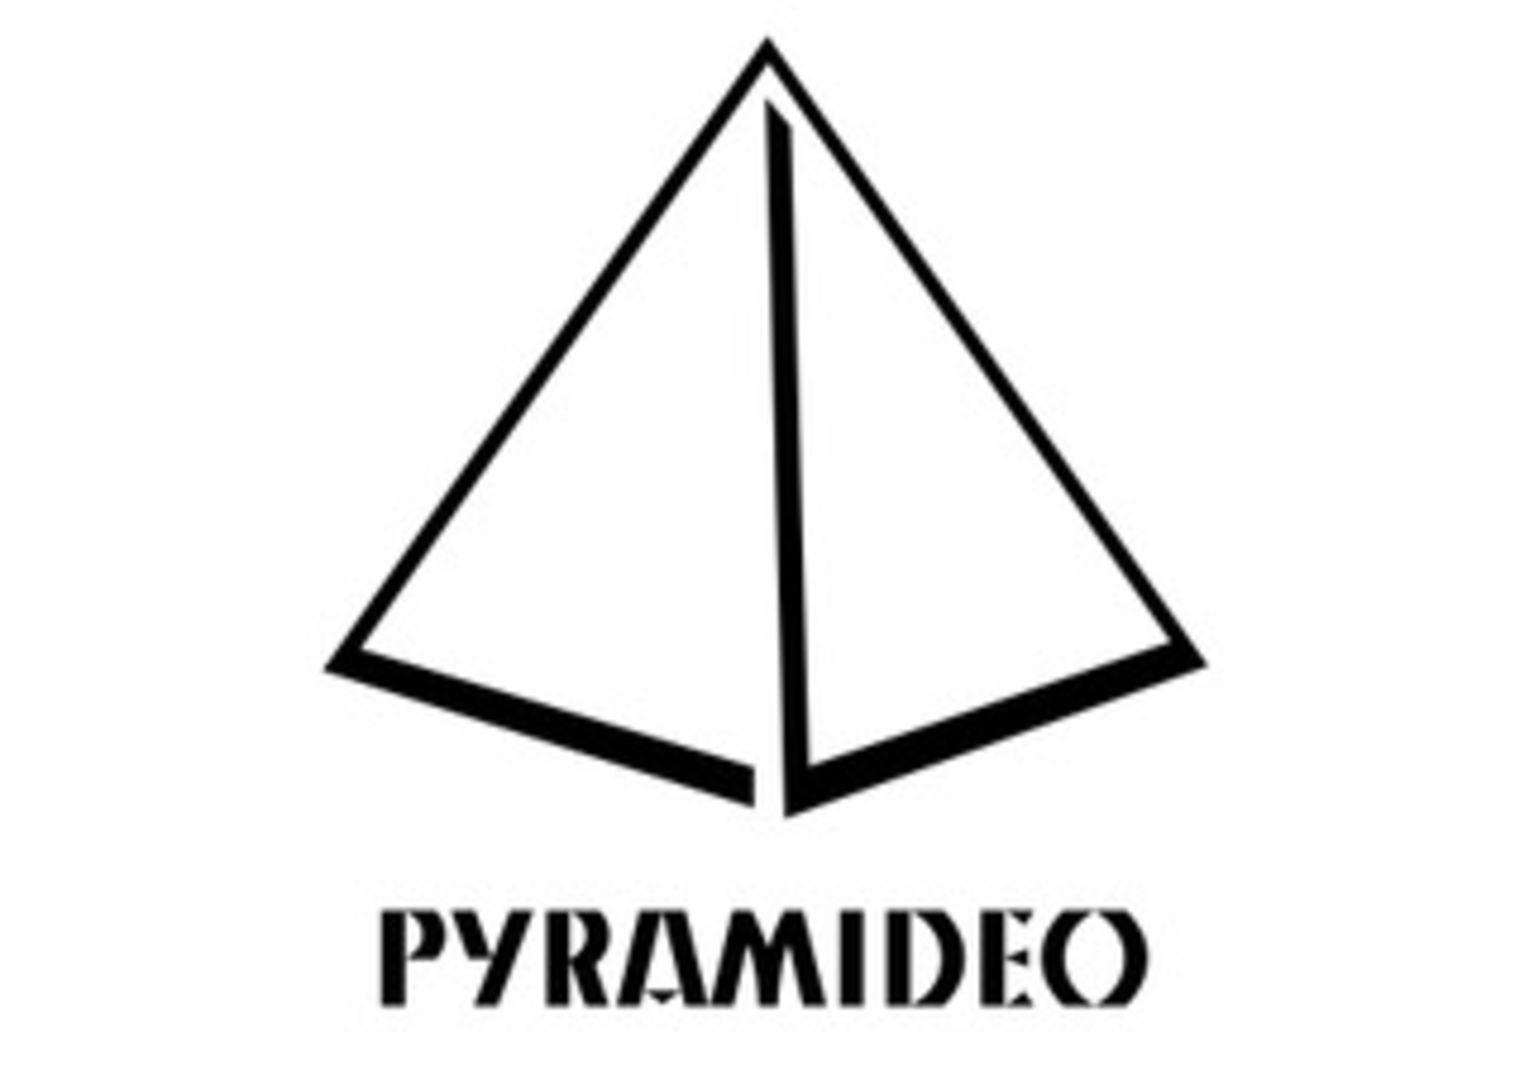 Pyramideo vighix